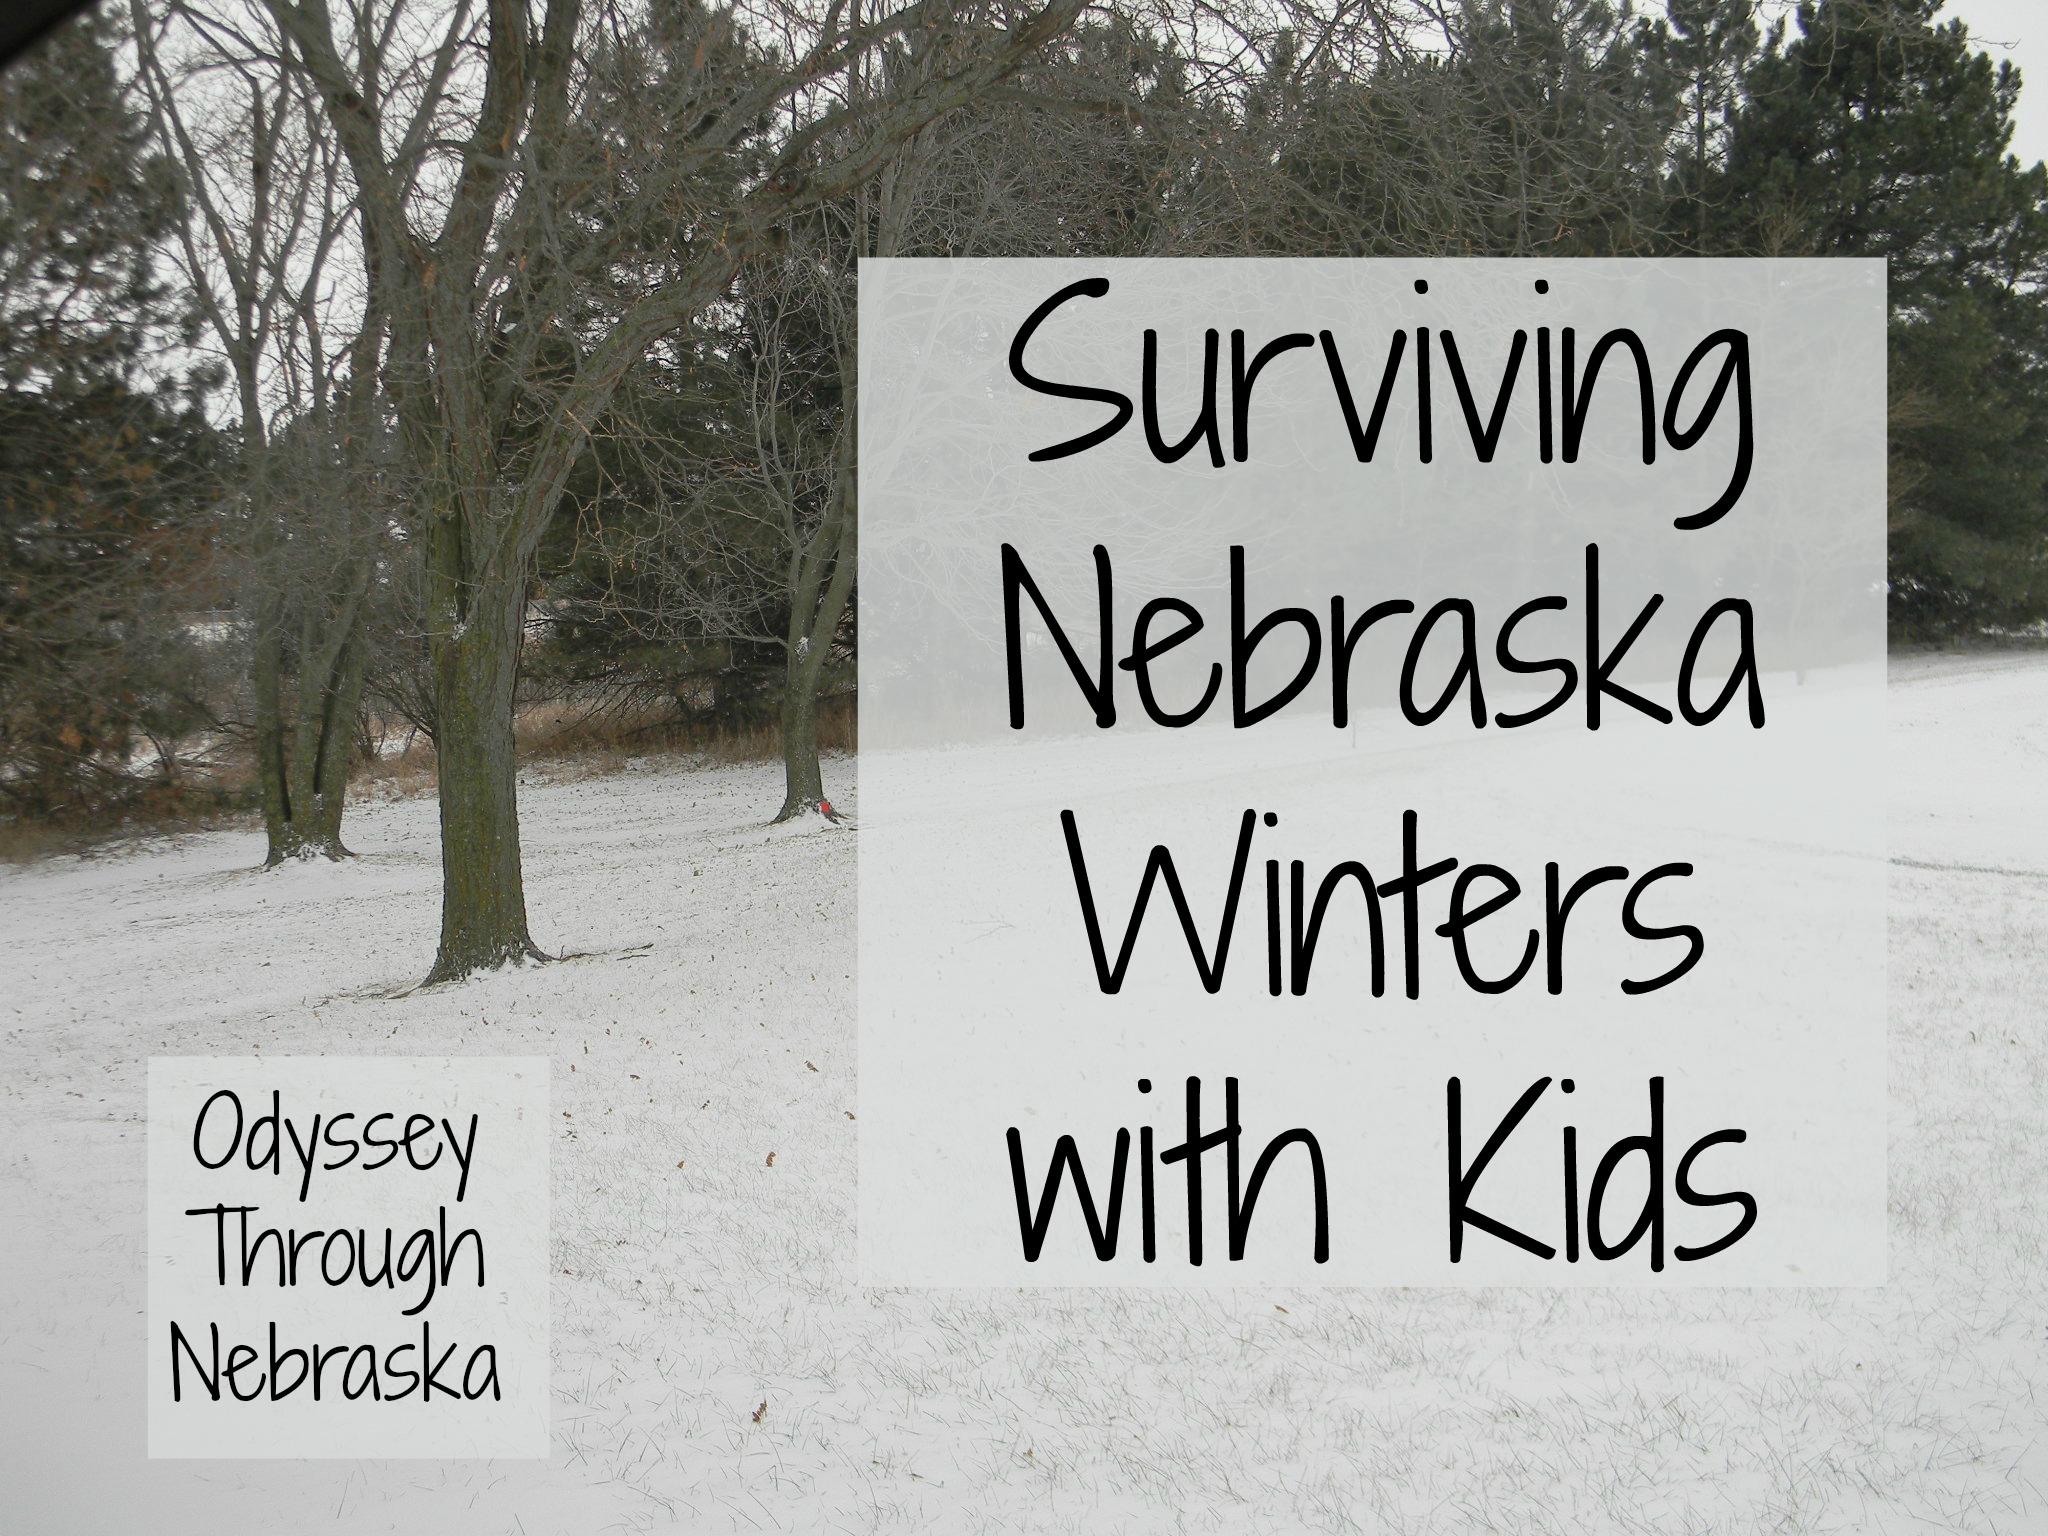 Surviving Nebraska winters with kids